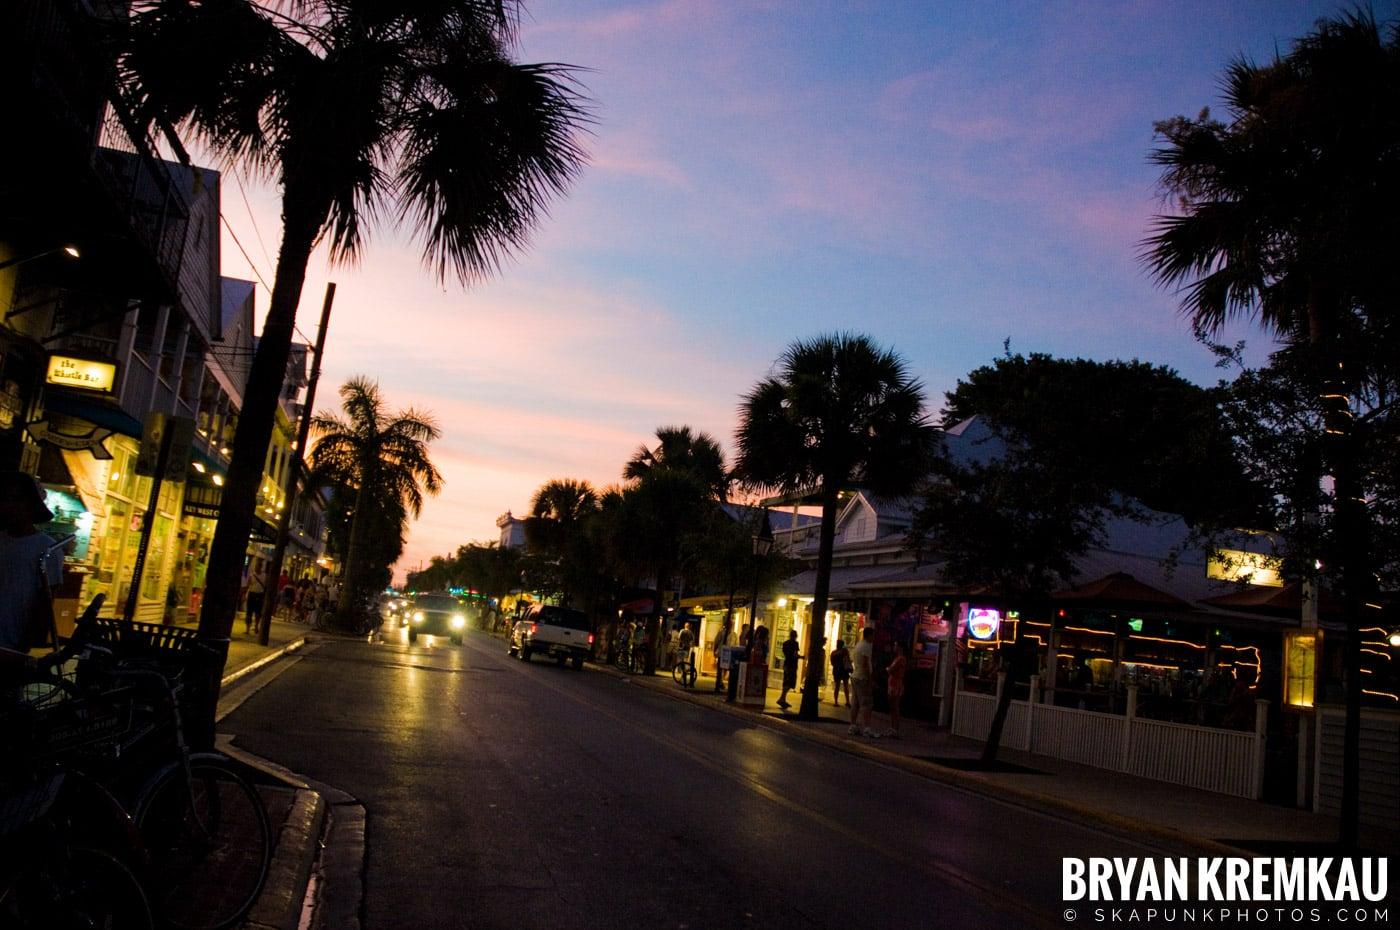 Florida Keys Vacation - 7.09.10 - 7.15.10 (9)